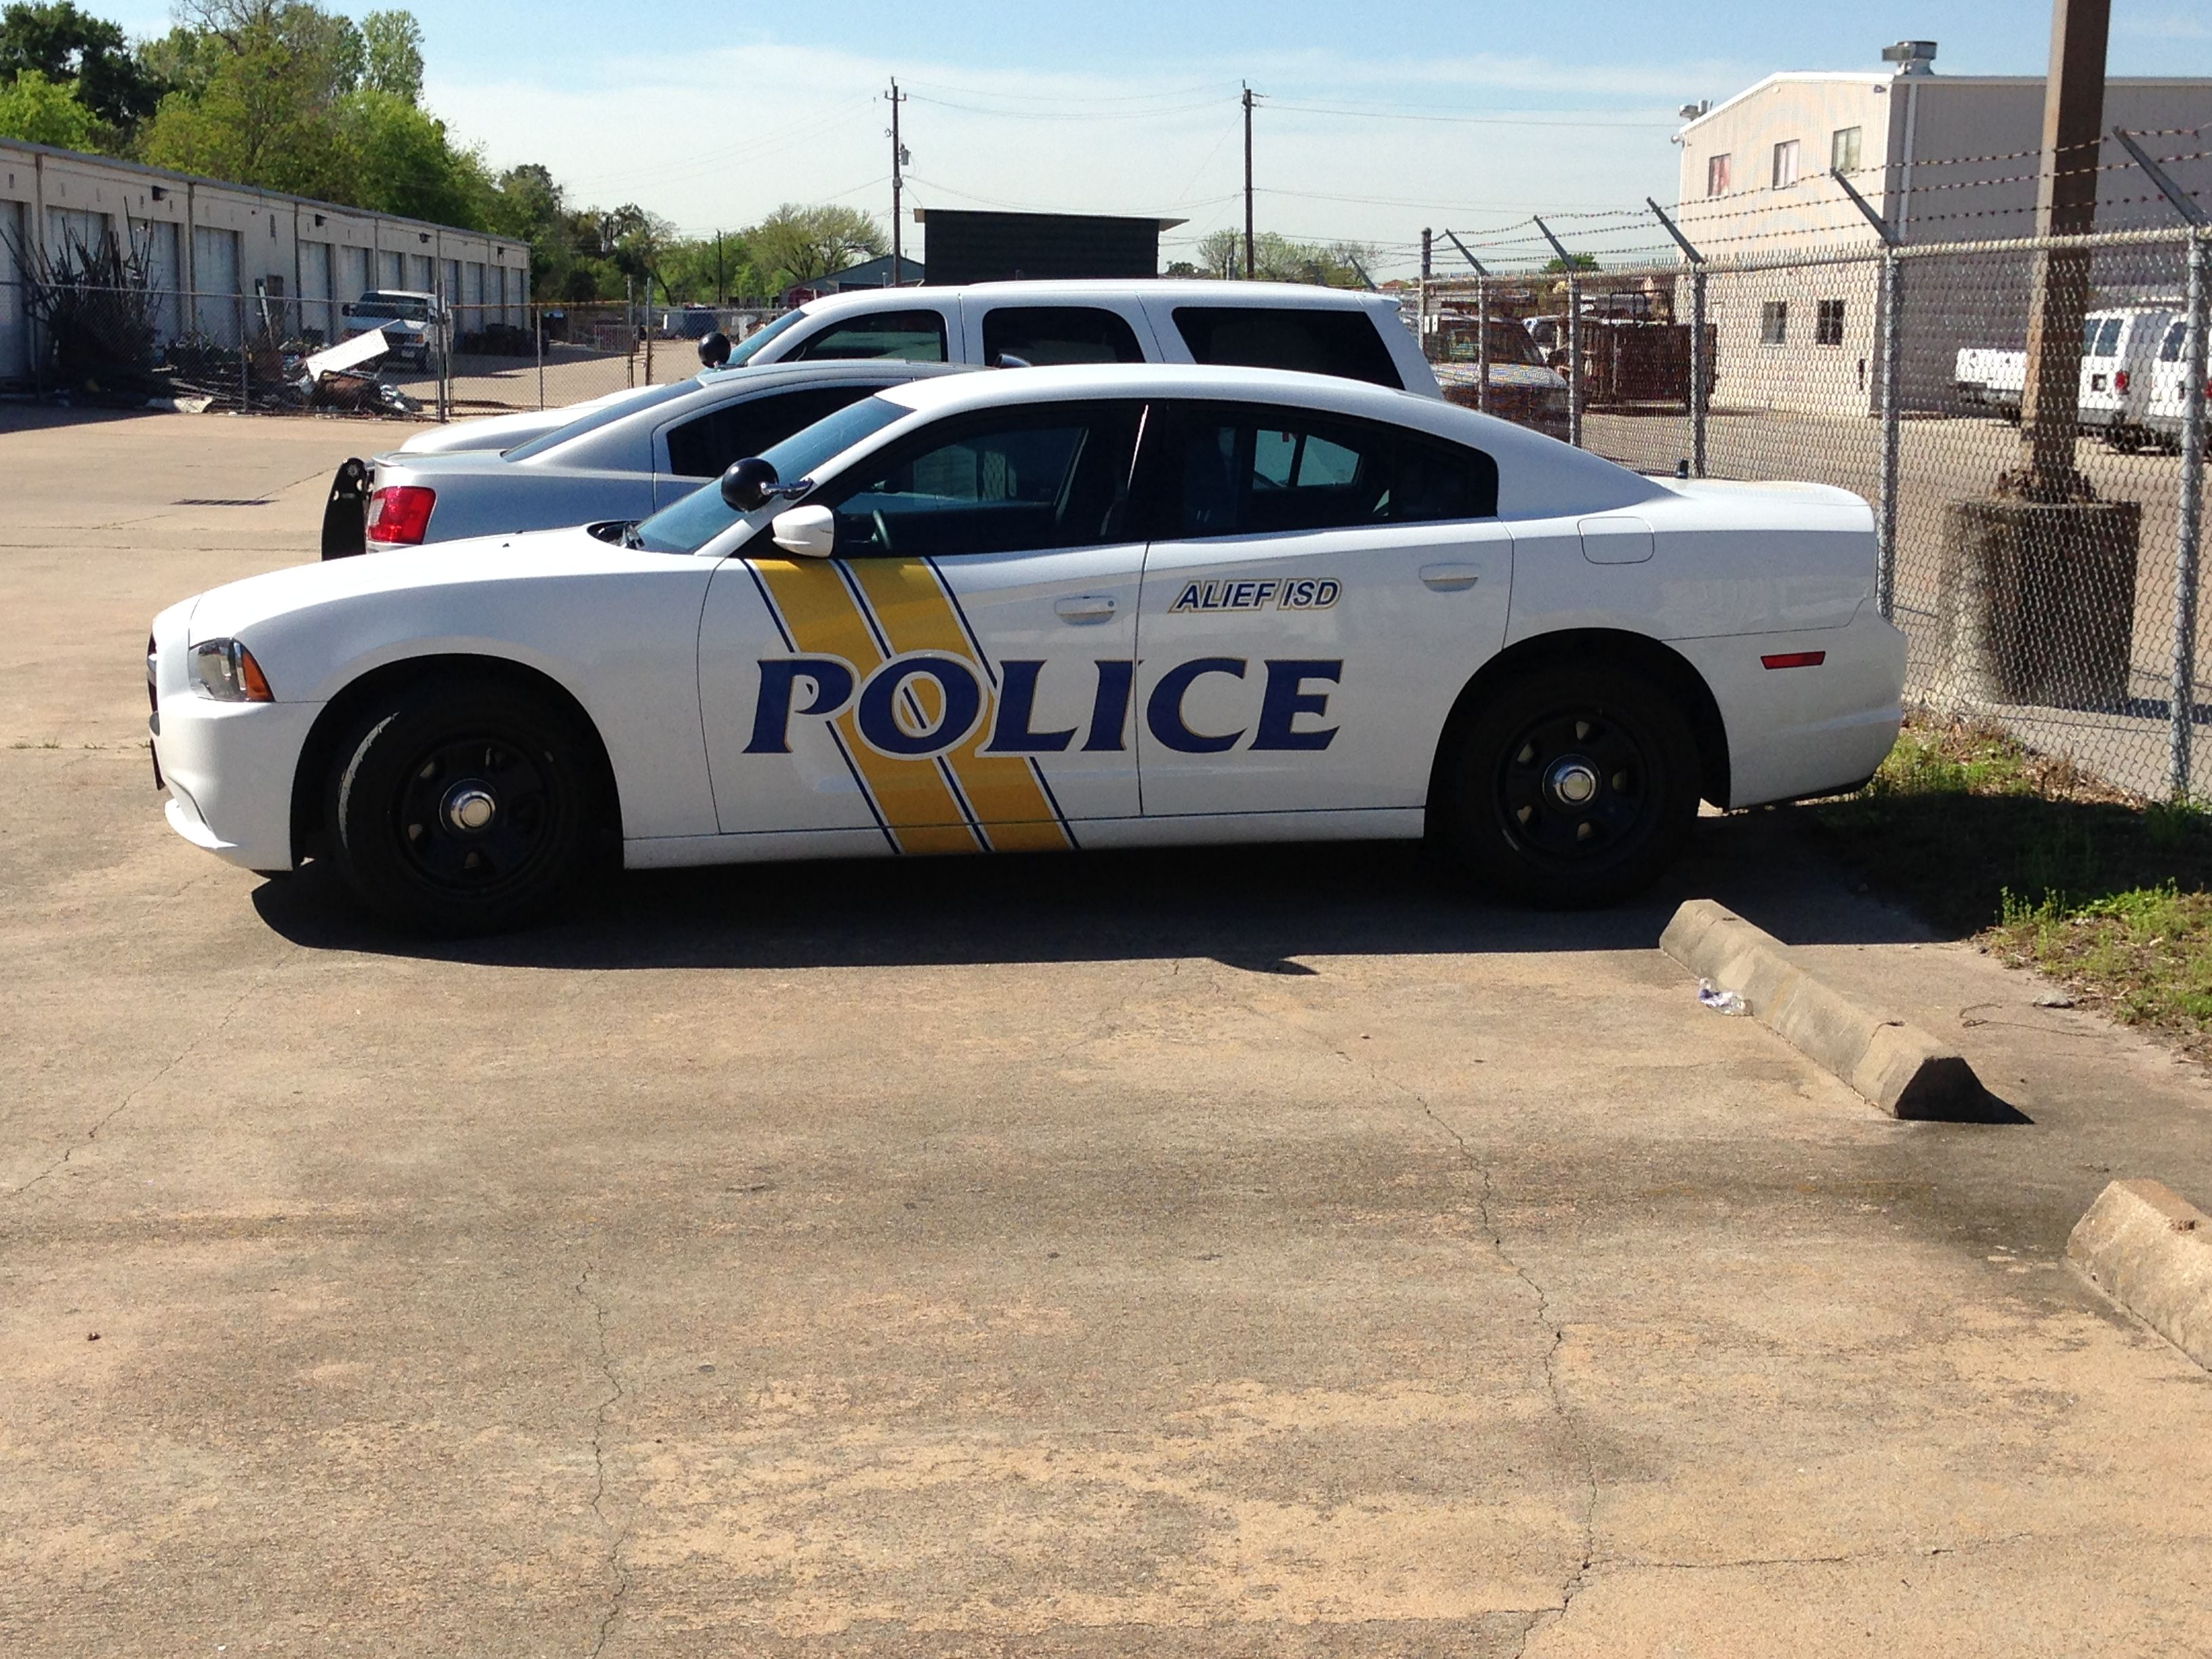 Alief ISD Police Dept. Slick Top Dodge Charger (Houston)   Police ...